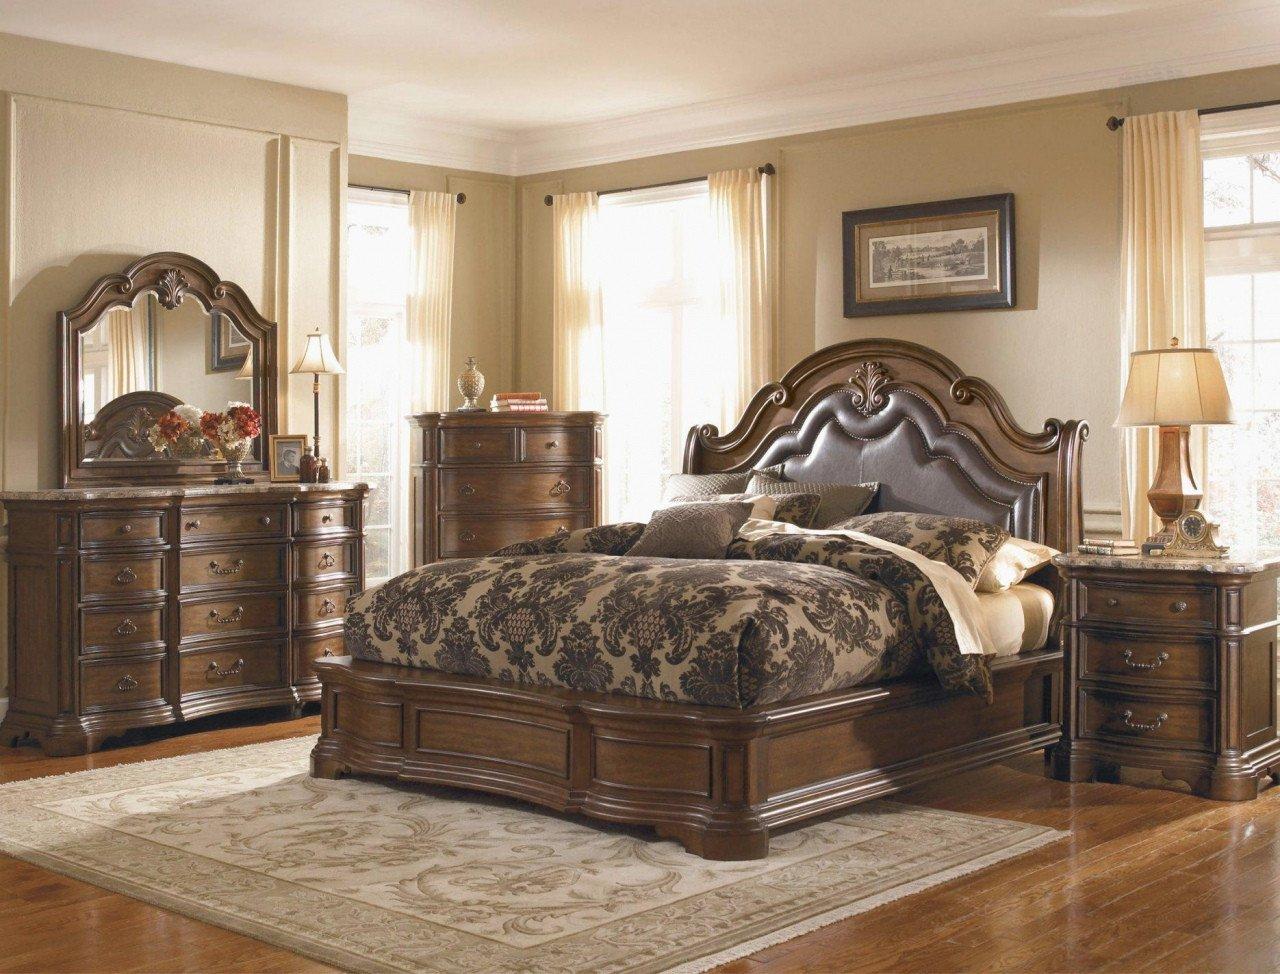 Mirrored Bedroom Furniture Set Fresh Gothic Bedroom Furniture — Procura Home Blog